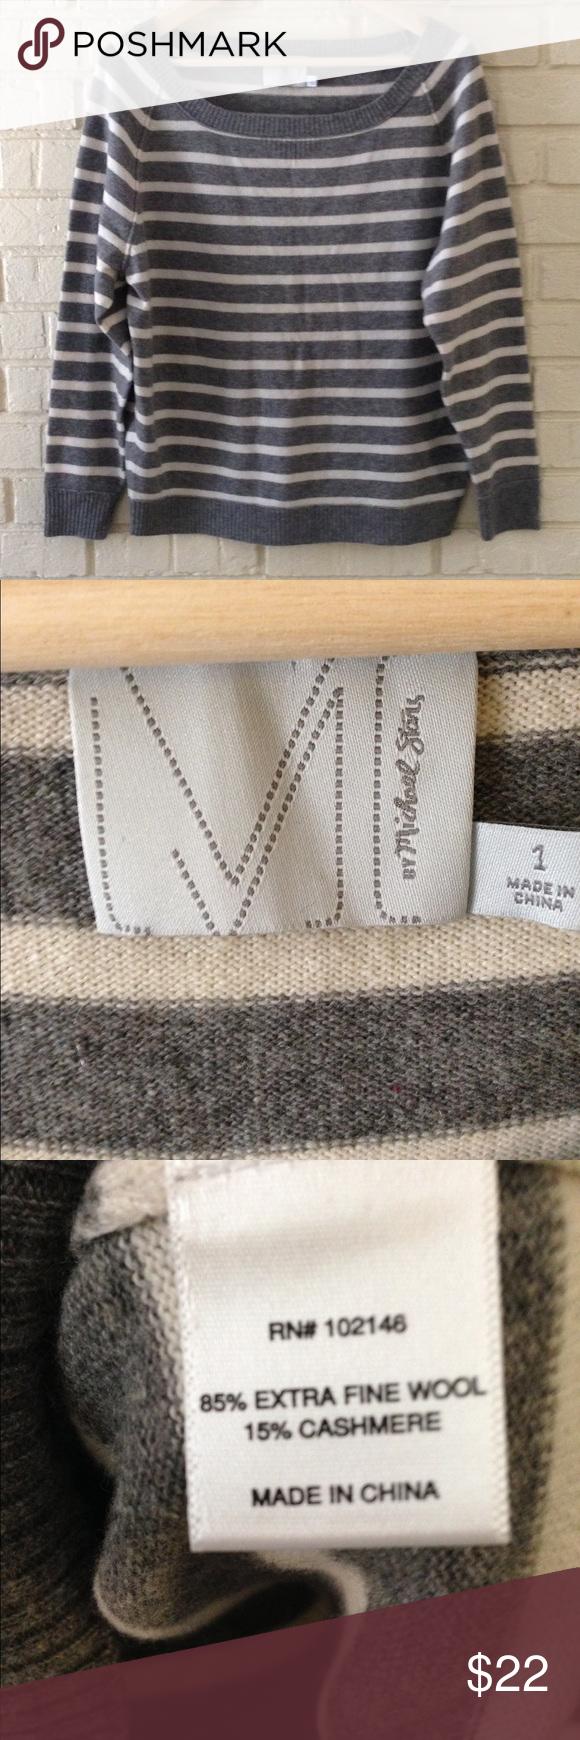 Wool and cashmere Michael Stars sweater Bet soft and cozy Michael Stars sweater! Size 1. Fits small to medium. Michael Stars Sweaters Crew & Scoop Necks